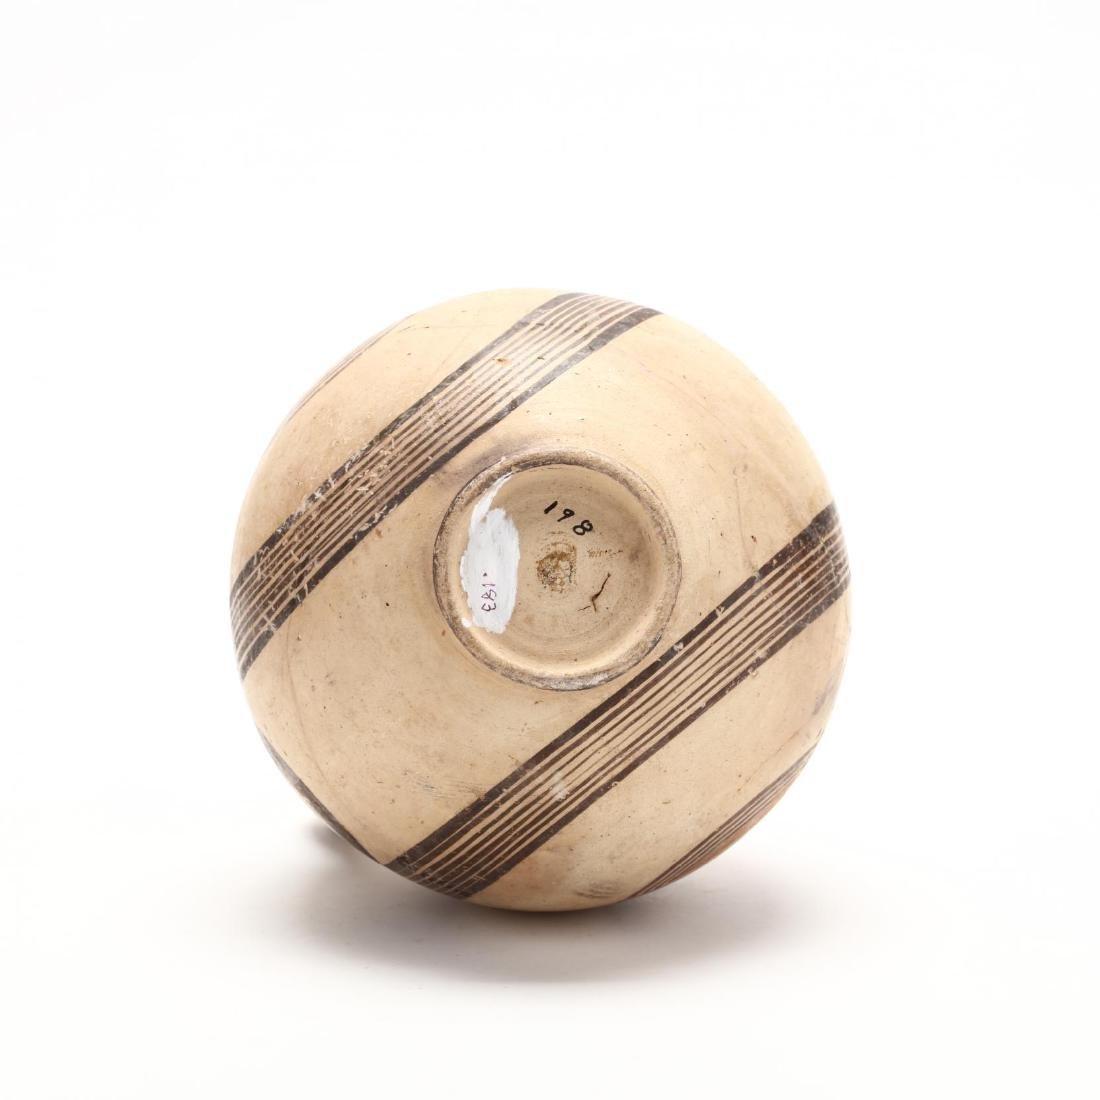 Cyprio-Archaic Barrel Form Bichrome Pitcher - 6